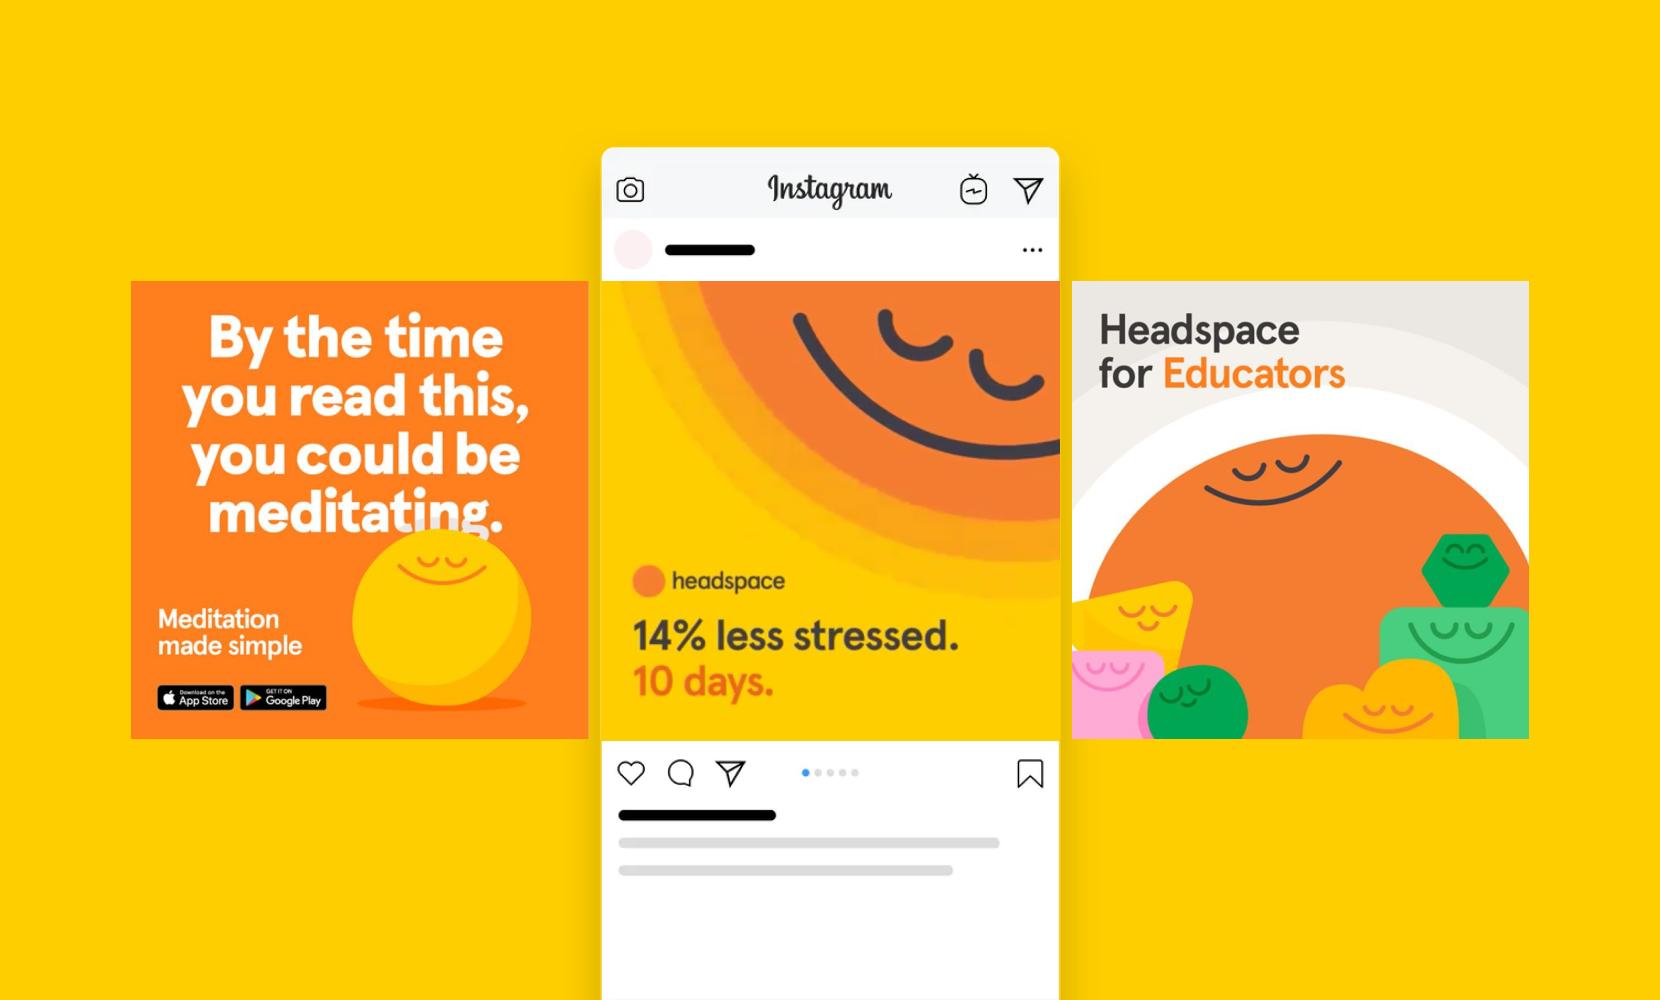 headspace ads design inspiration